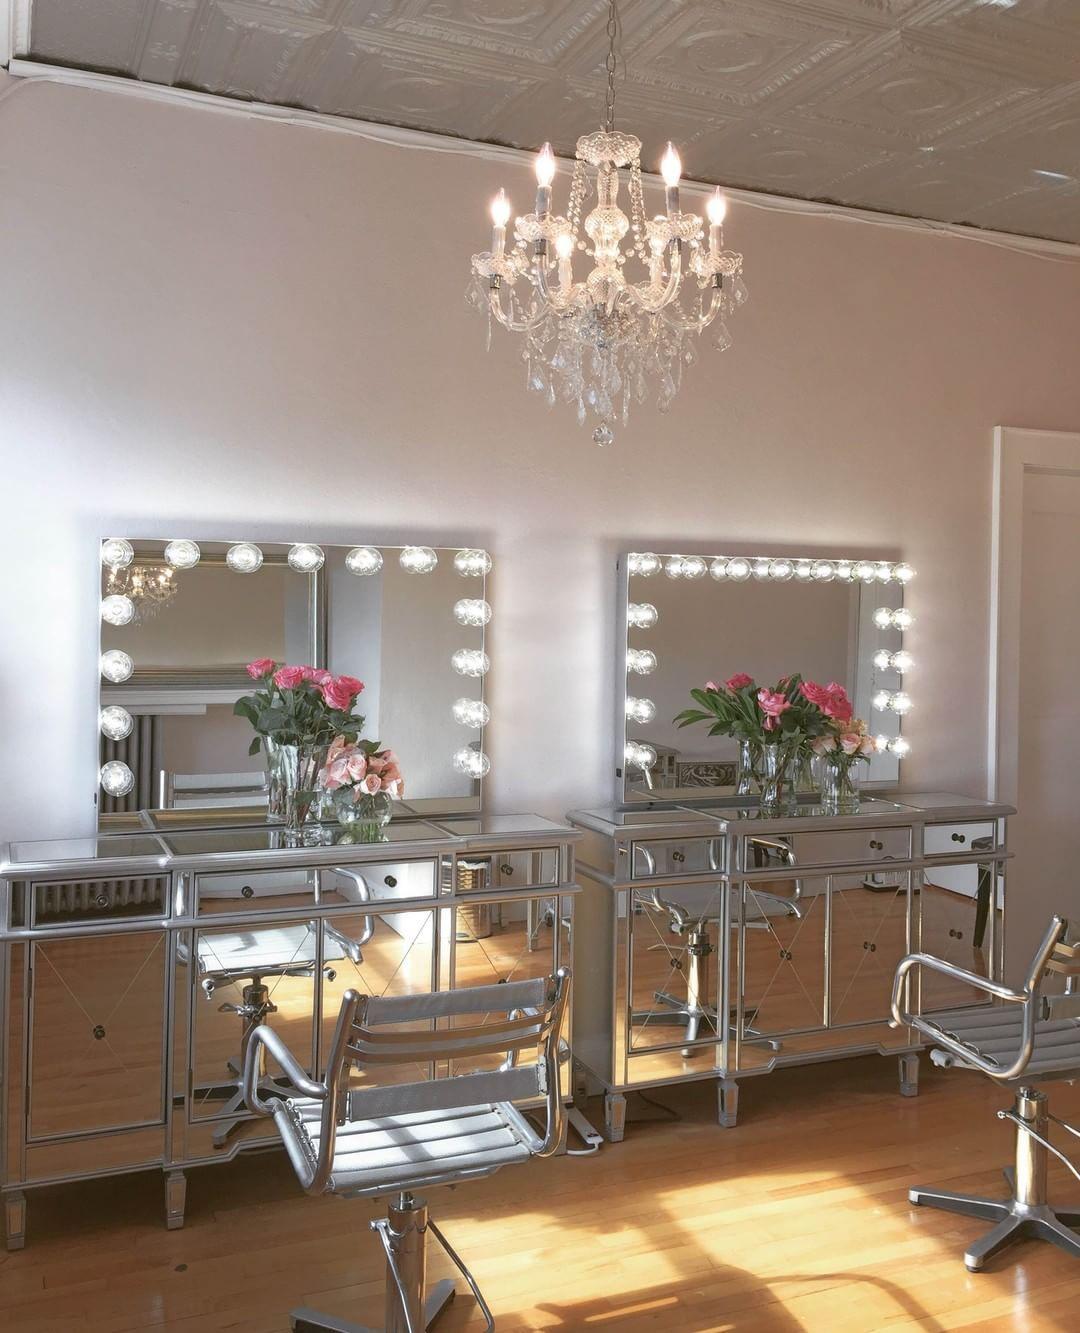 Hollywood Glow Pro Vanity Mirror Impressions Vanity Co Makeup Studio Decor Beauty Salon Decor Makeup Room Design